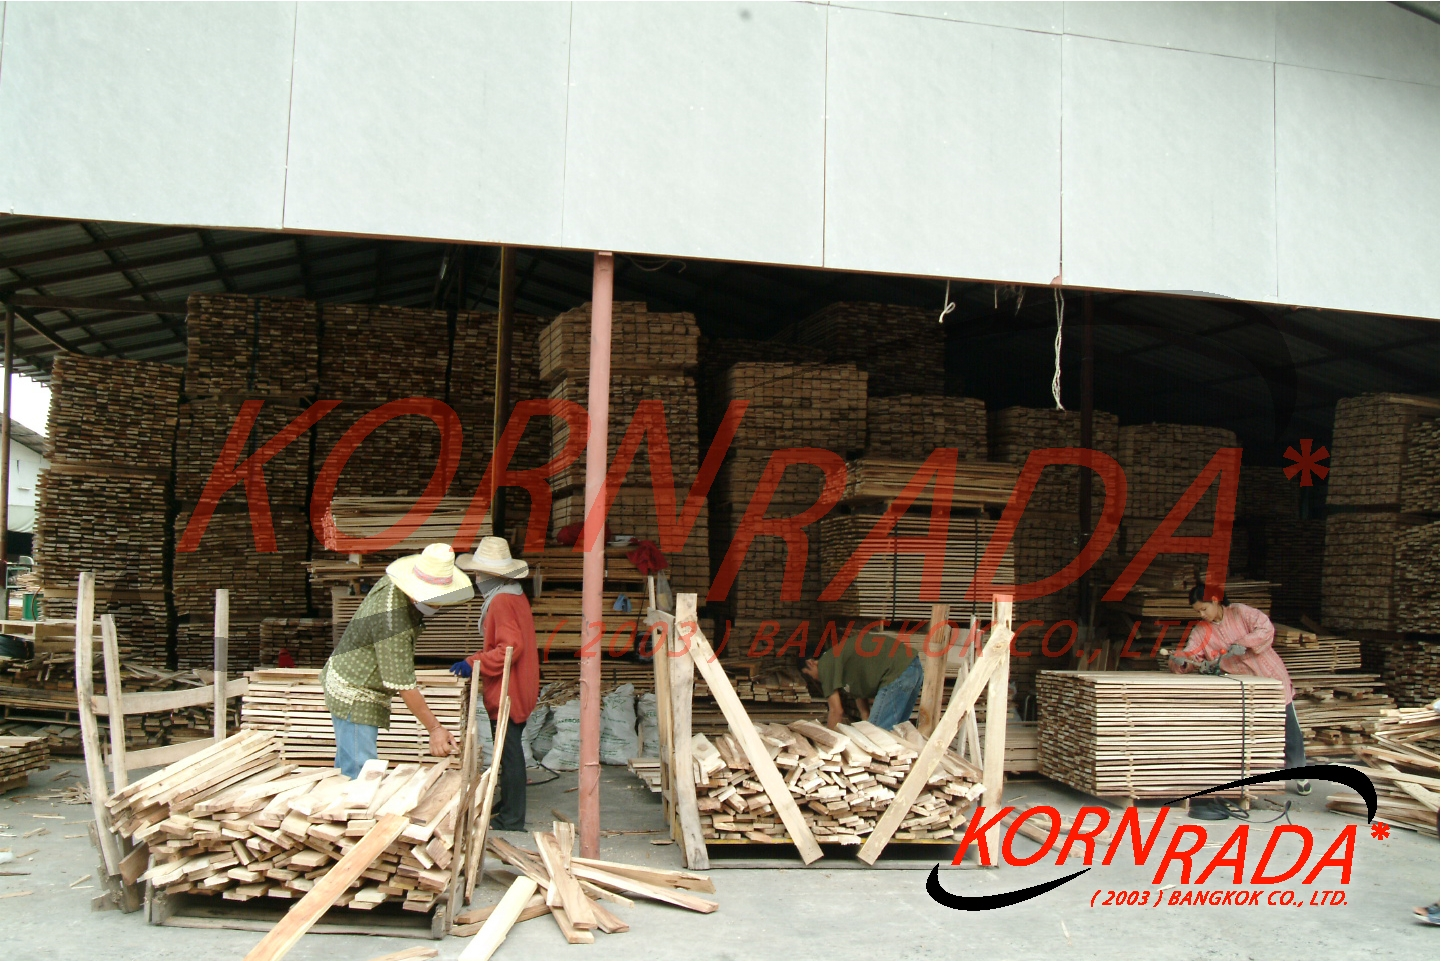 kornrada_production_1664